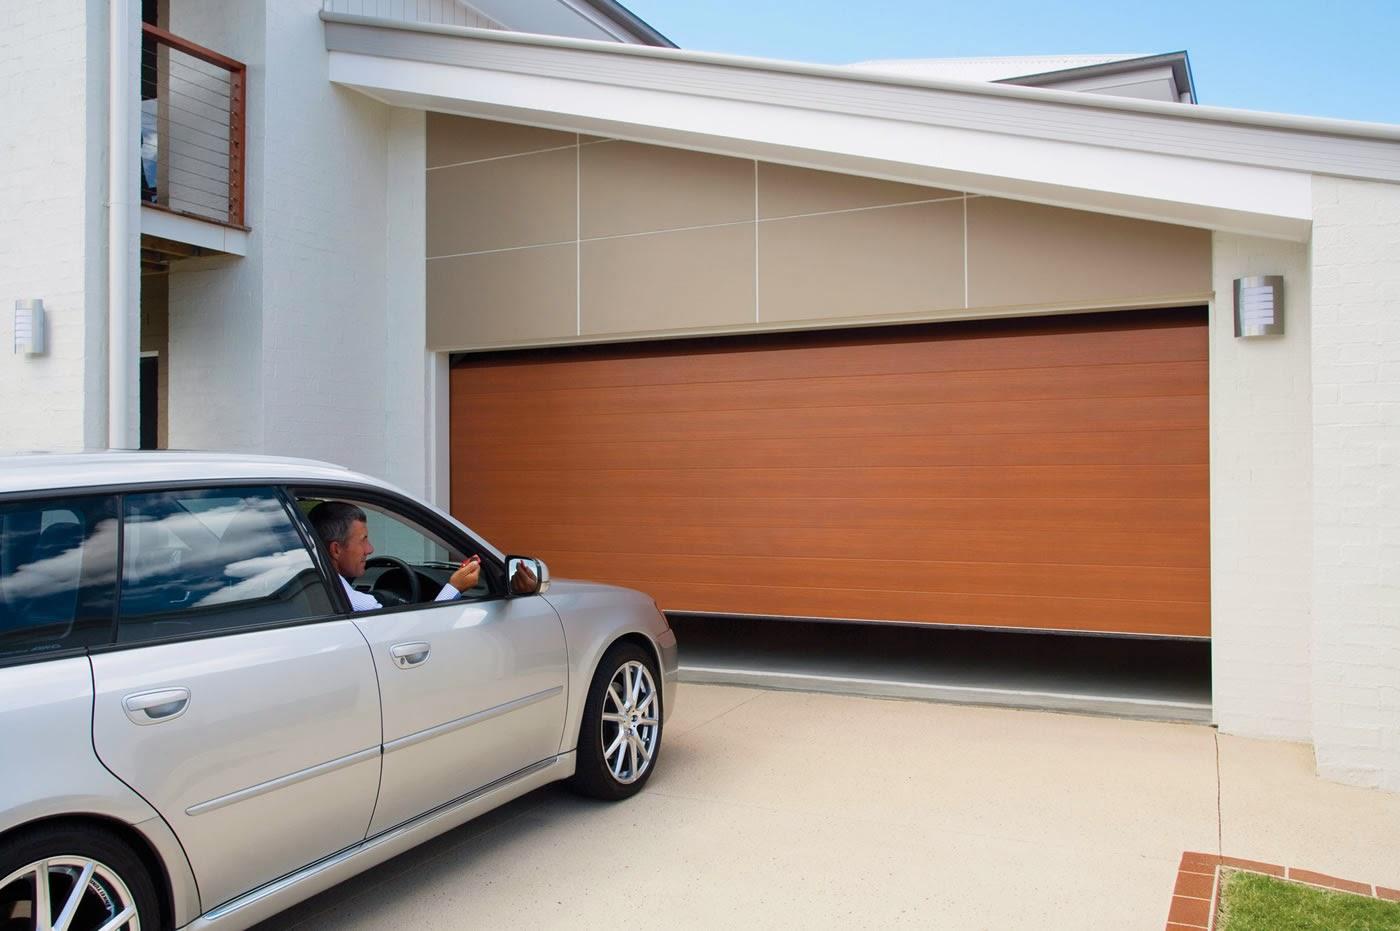 how to manually lock garage door from inside